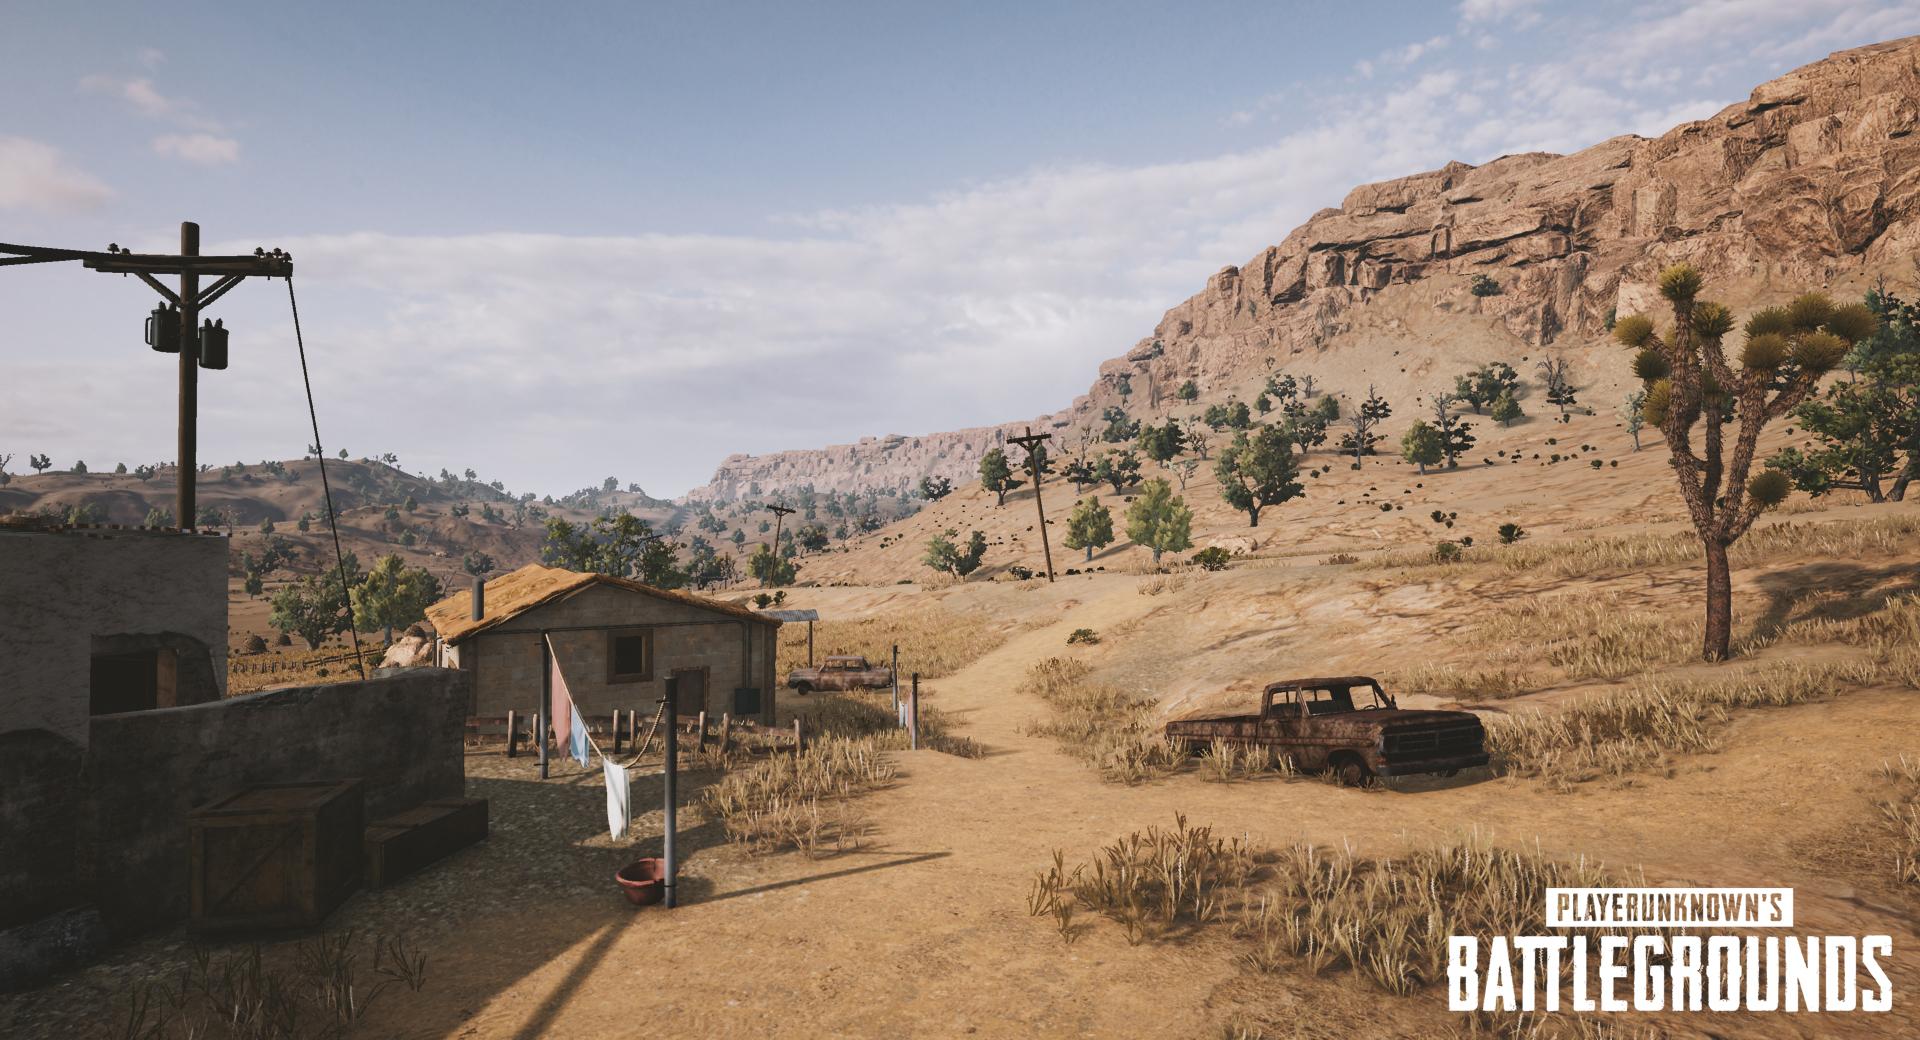 https://images.nvidia.com/geforce-com/international/images/playerunknowns-battlegrounds/playerunknowns-battlegrounds-nvidia-desert-map-screenshot-003.jpg